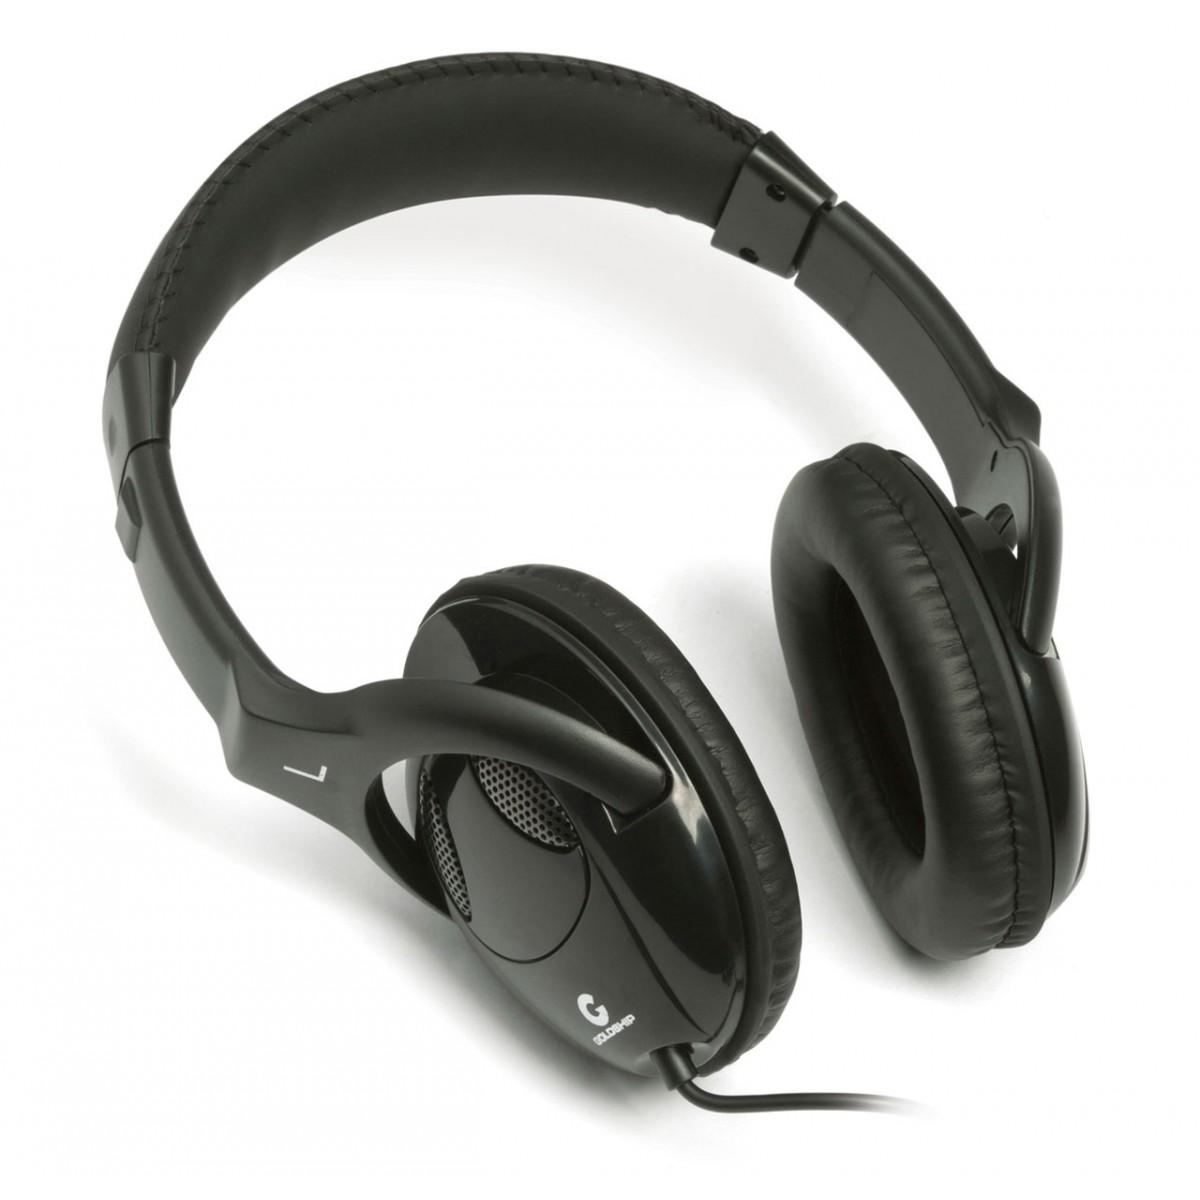 Headphone quality 1751 - Leadership